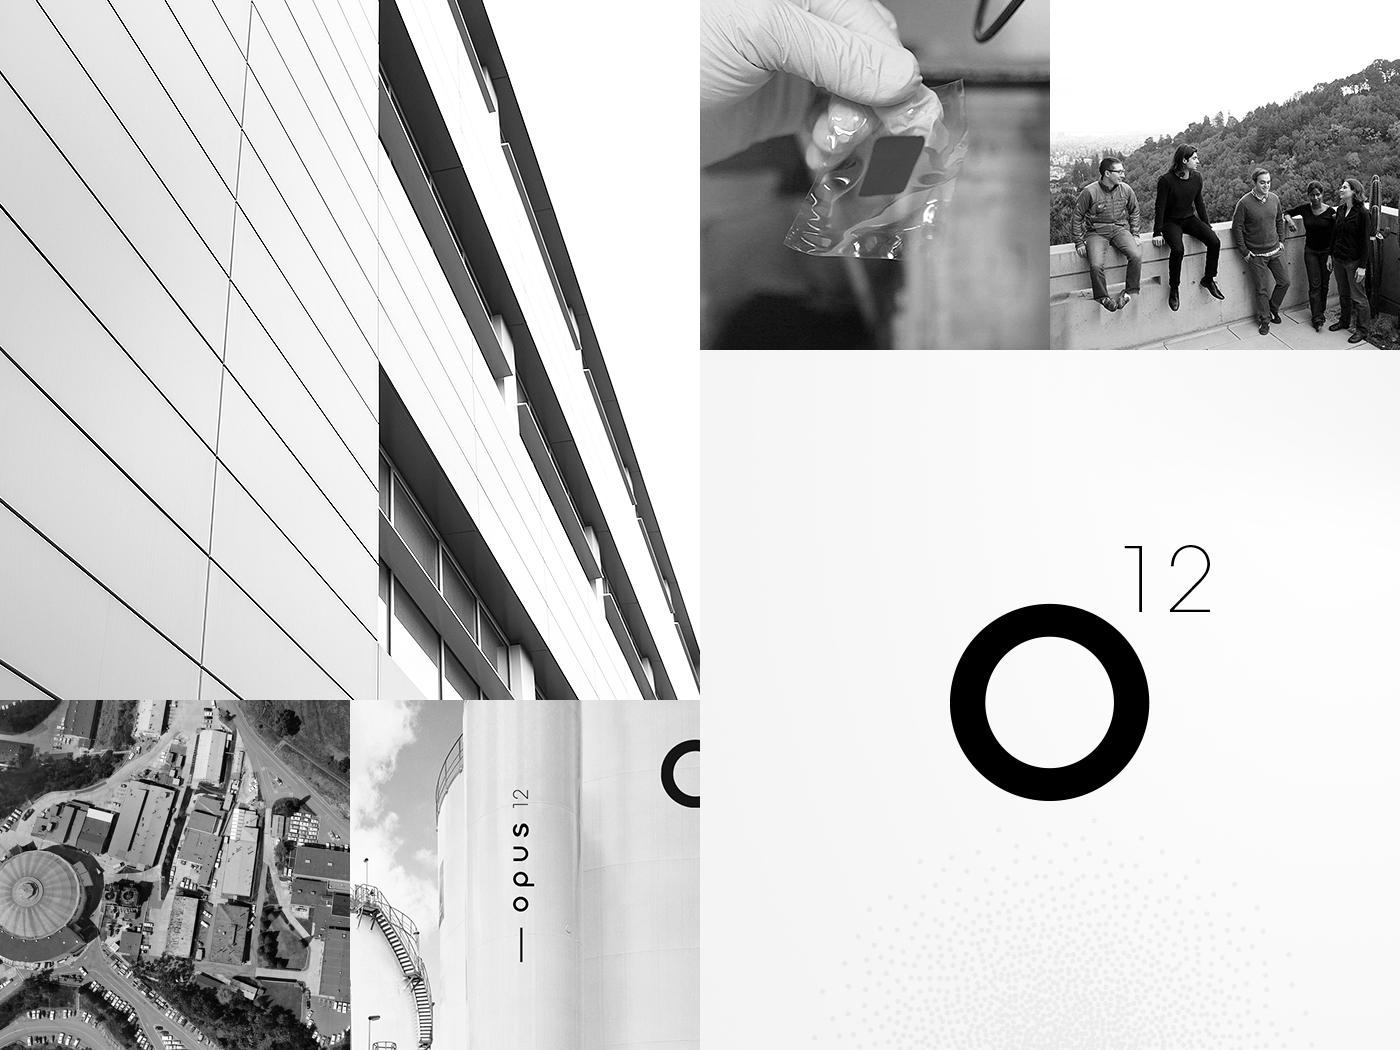 image-grid-lifestyle-1.jpg